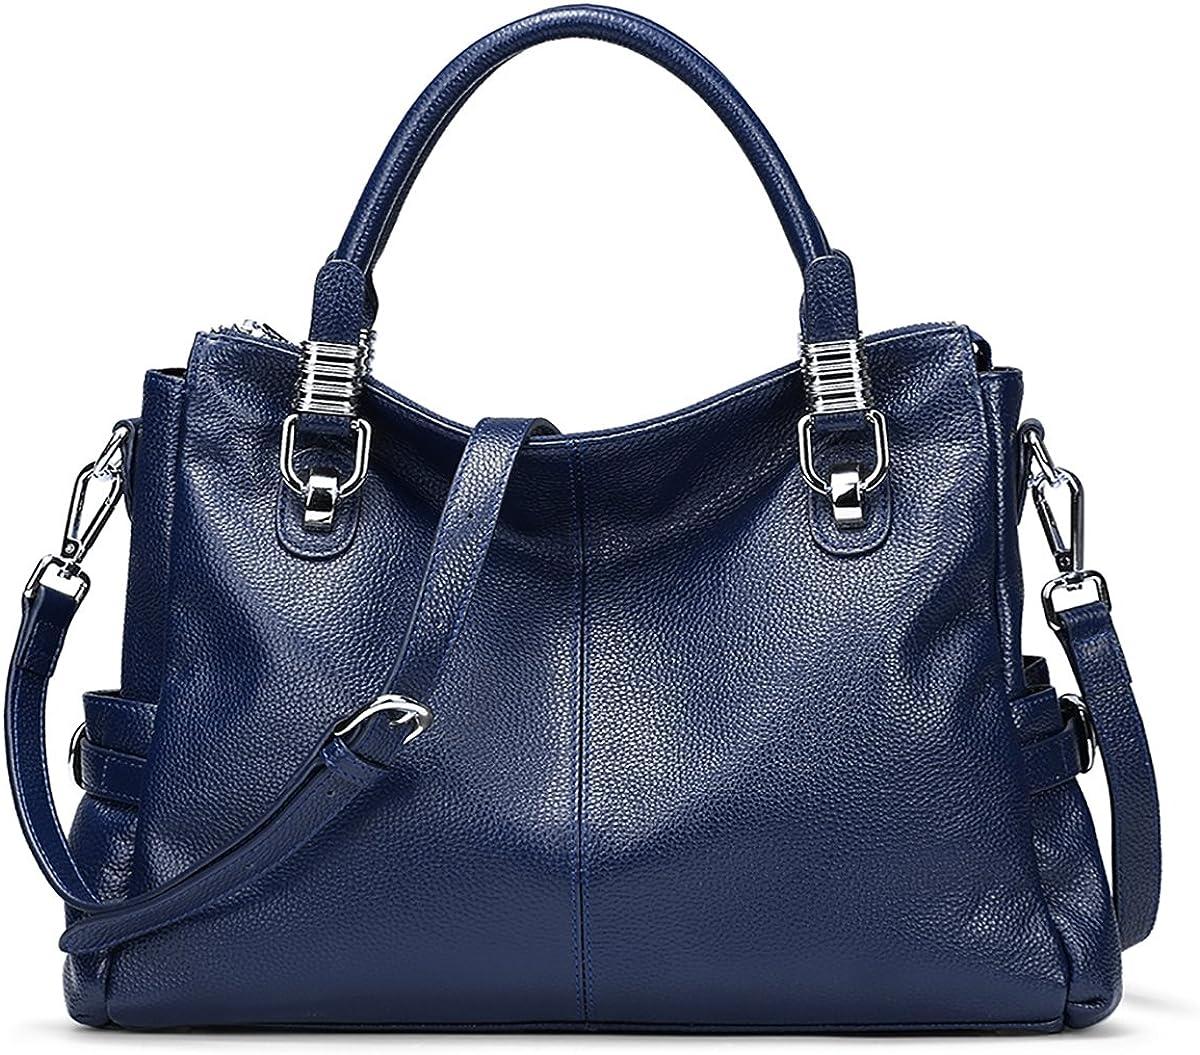 S-ZONE Womens Vintage Genuine Leather Tote Shoulder Bag Top-Handle Crossbody Handbags Ladies Purse